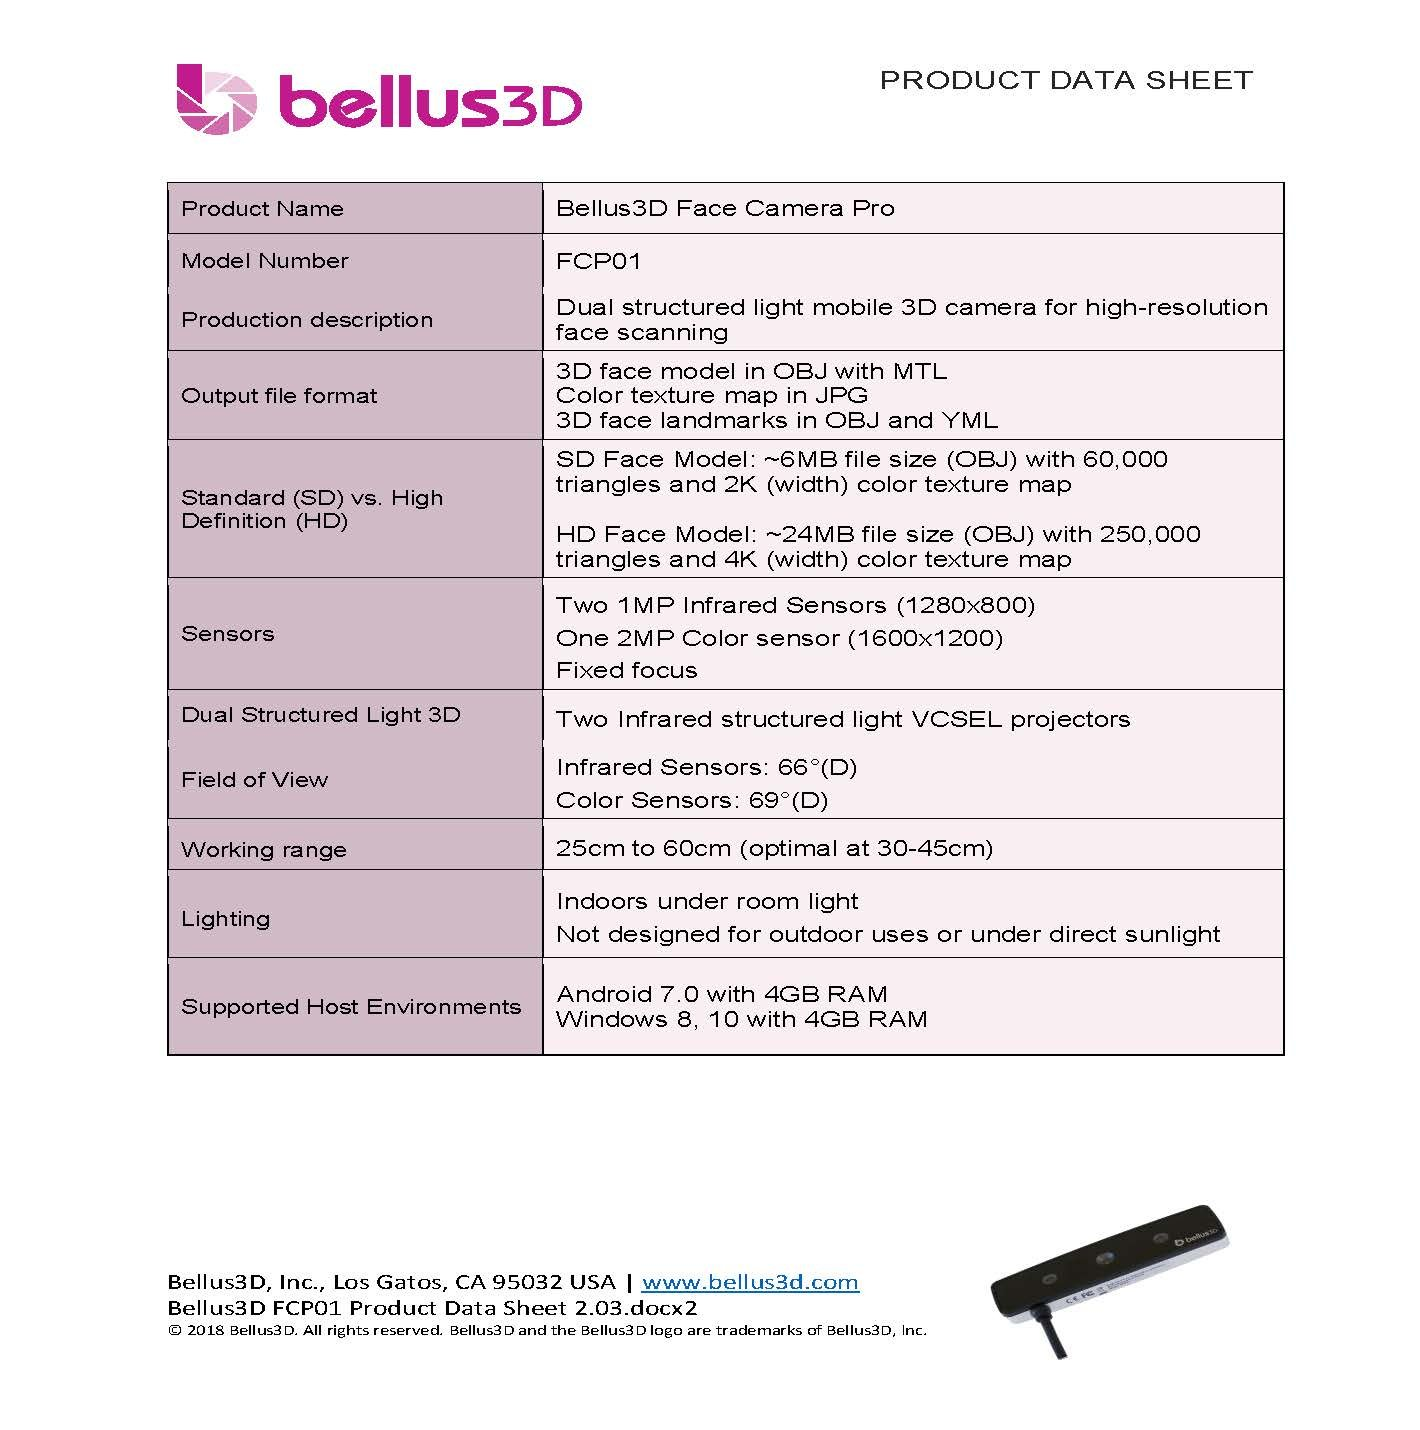 Bellus3D Face Camera Pro